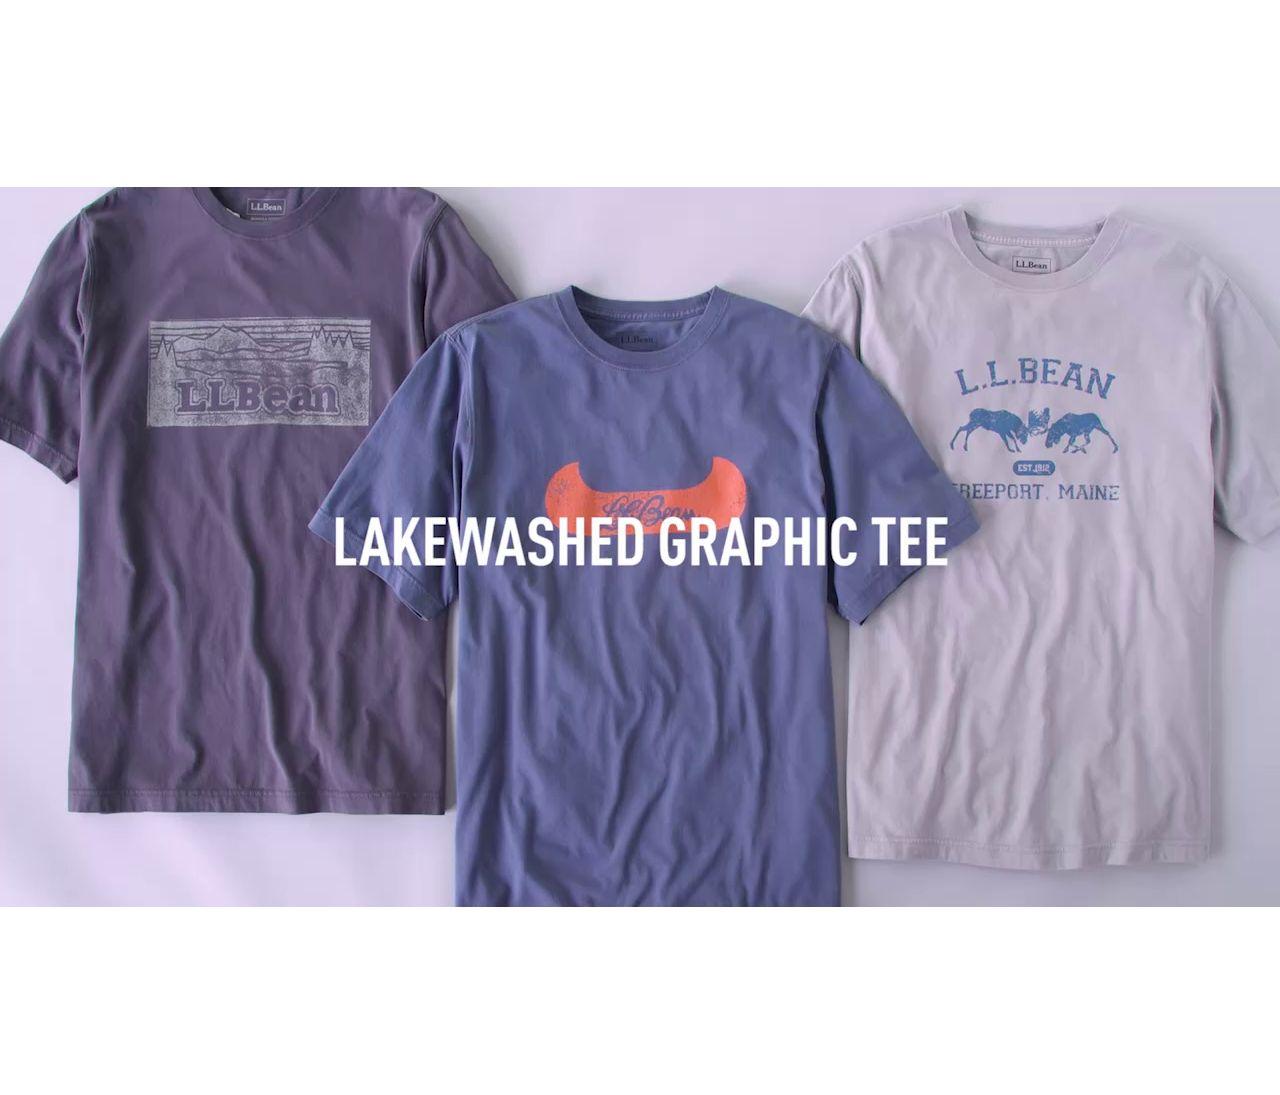 Video: Lakewashed Graphic Tee